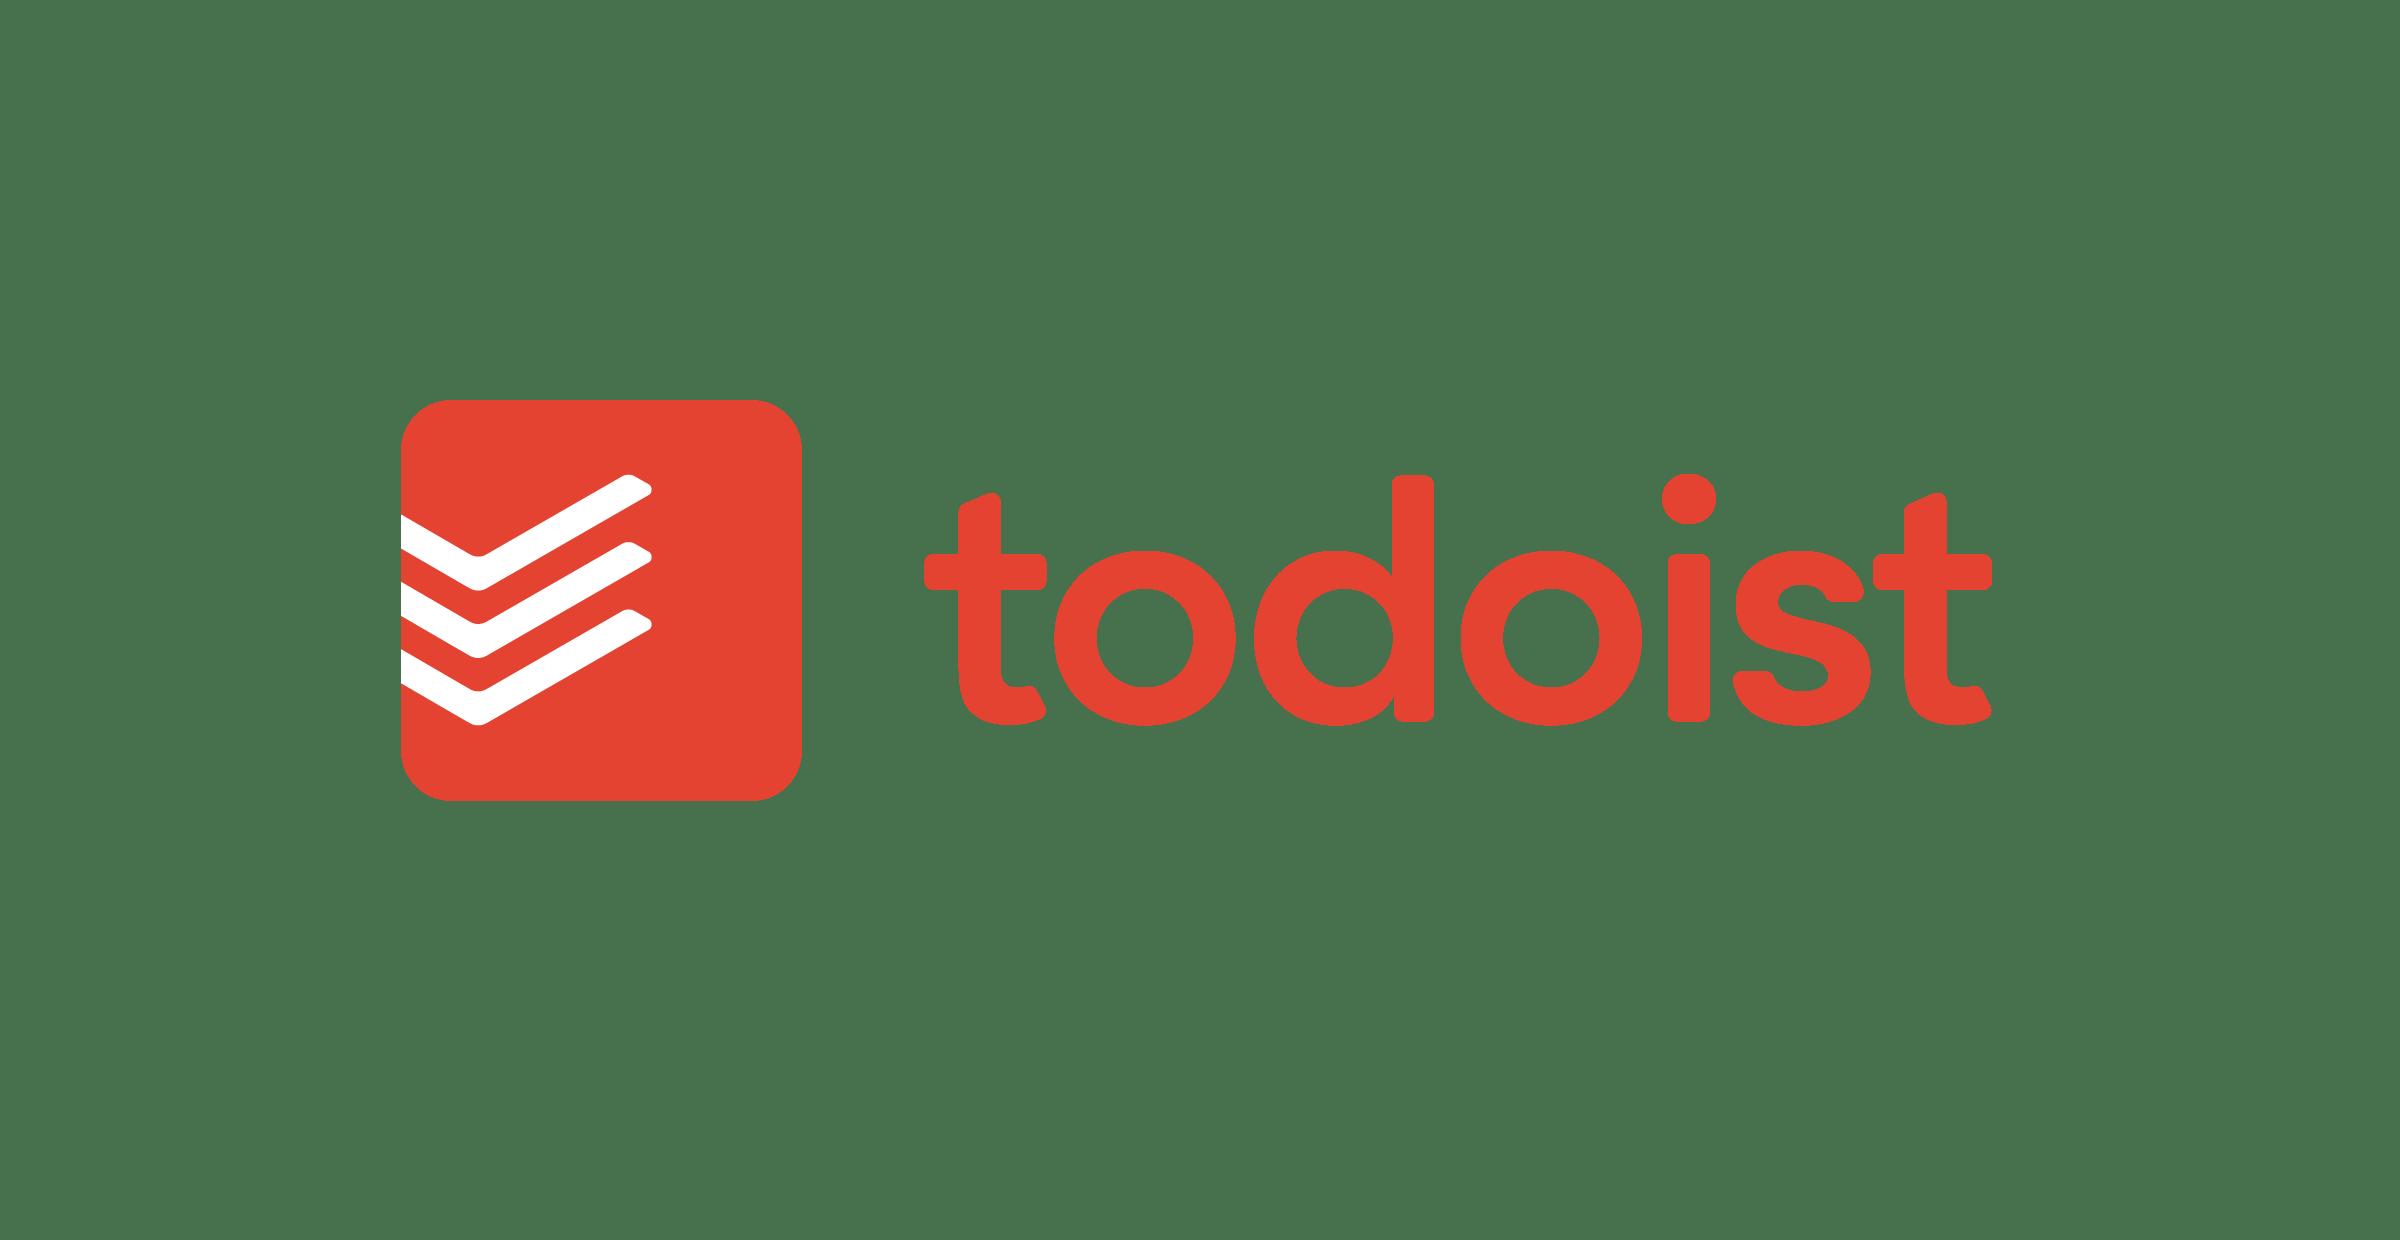 Todoist Business logo